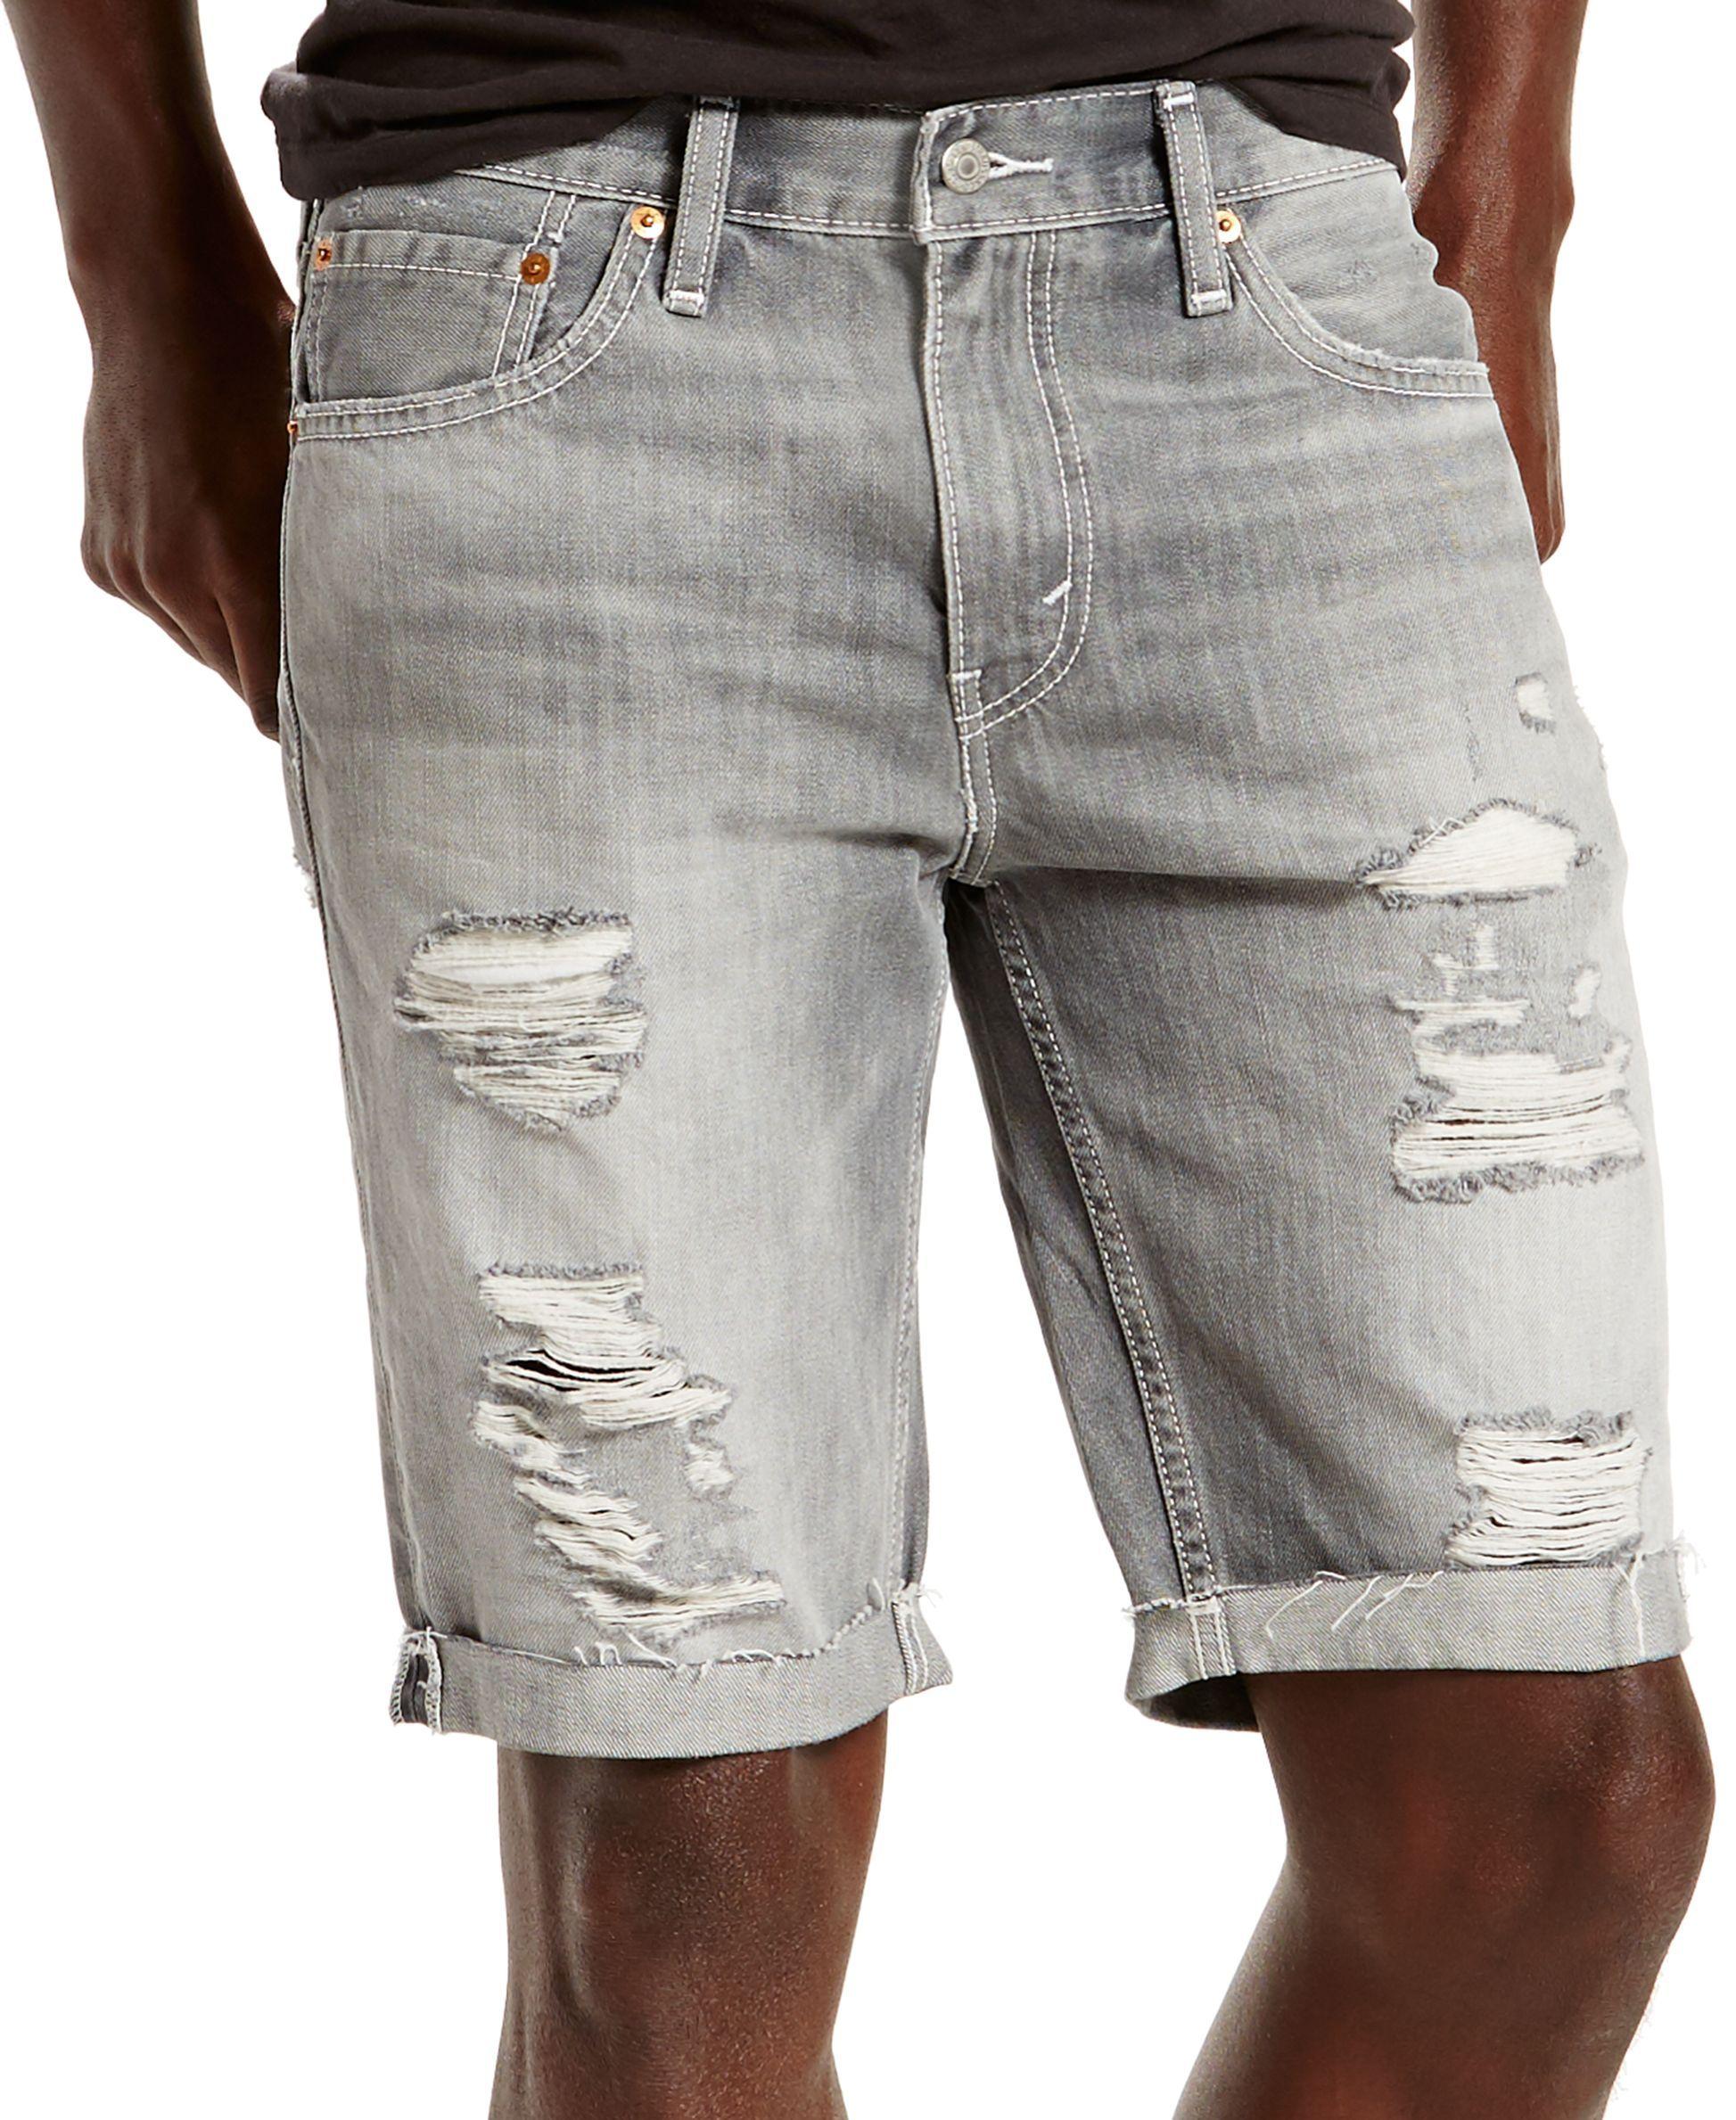 eee113b7 Levi's 511 Slim-Fit Goodlands Grey Cutoff Ripped Jean Shorts ...